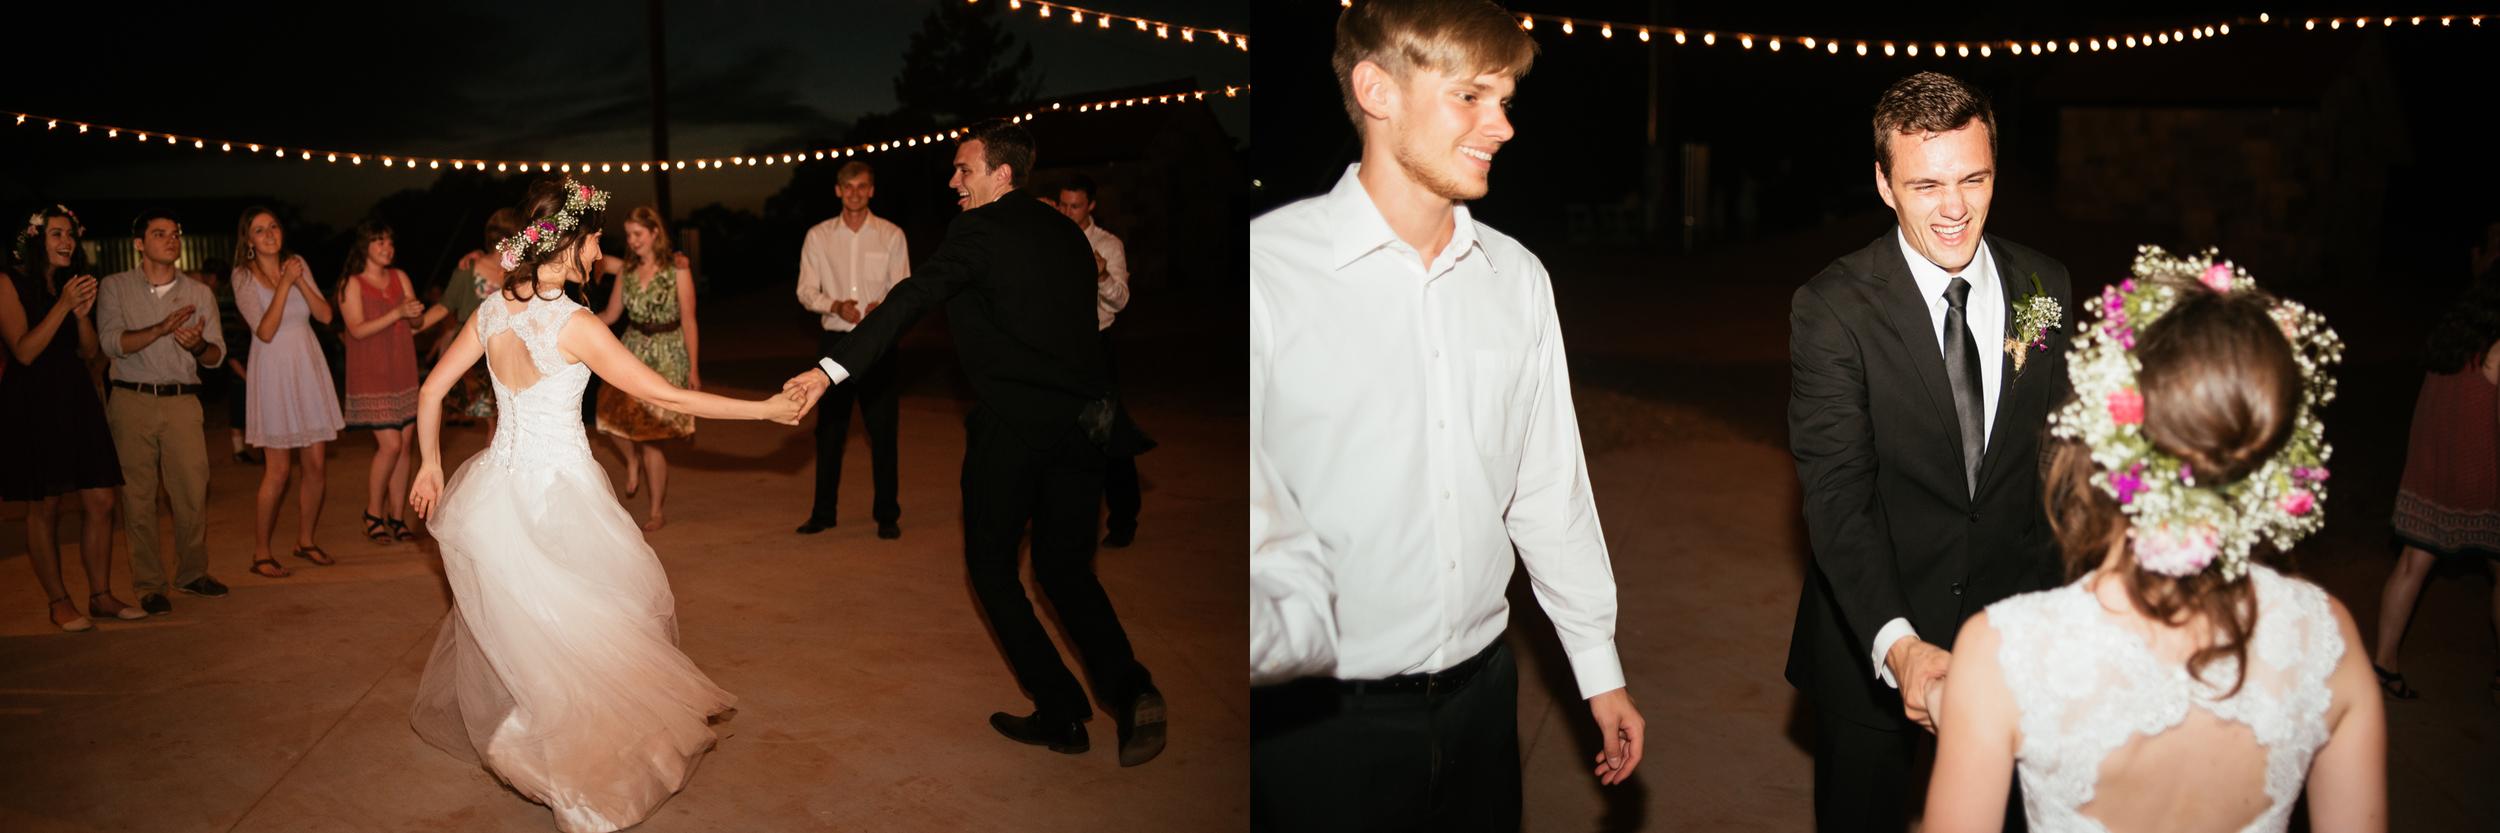 McCurrach Wedding20.jpg